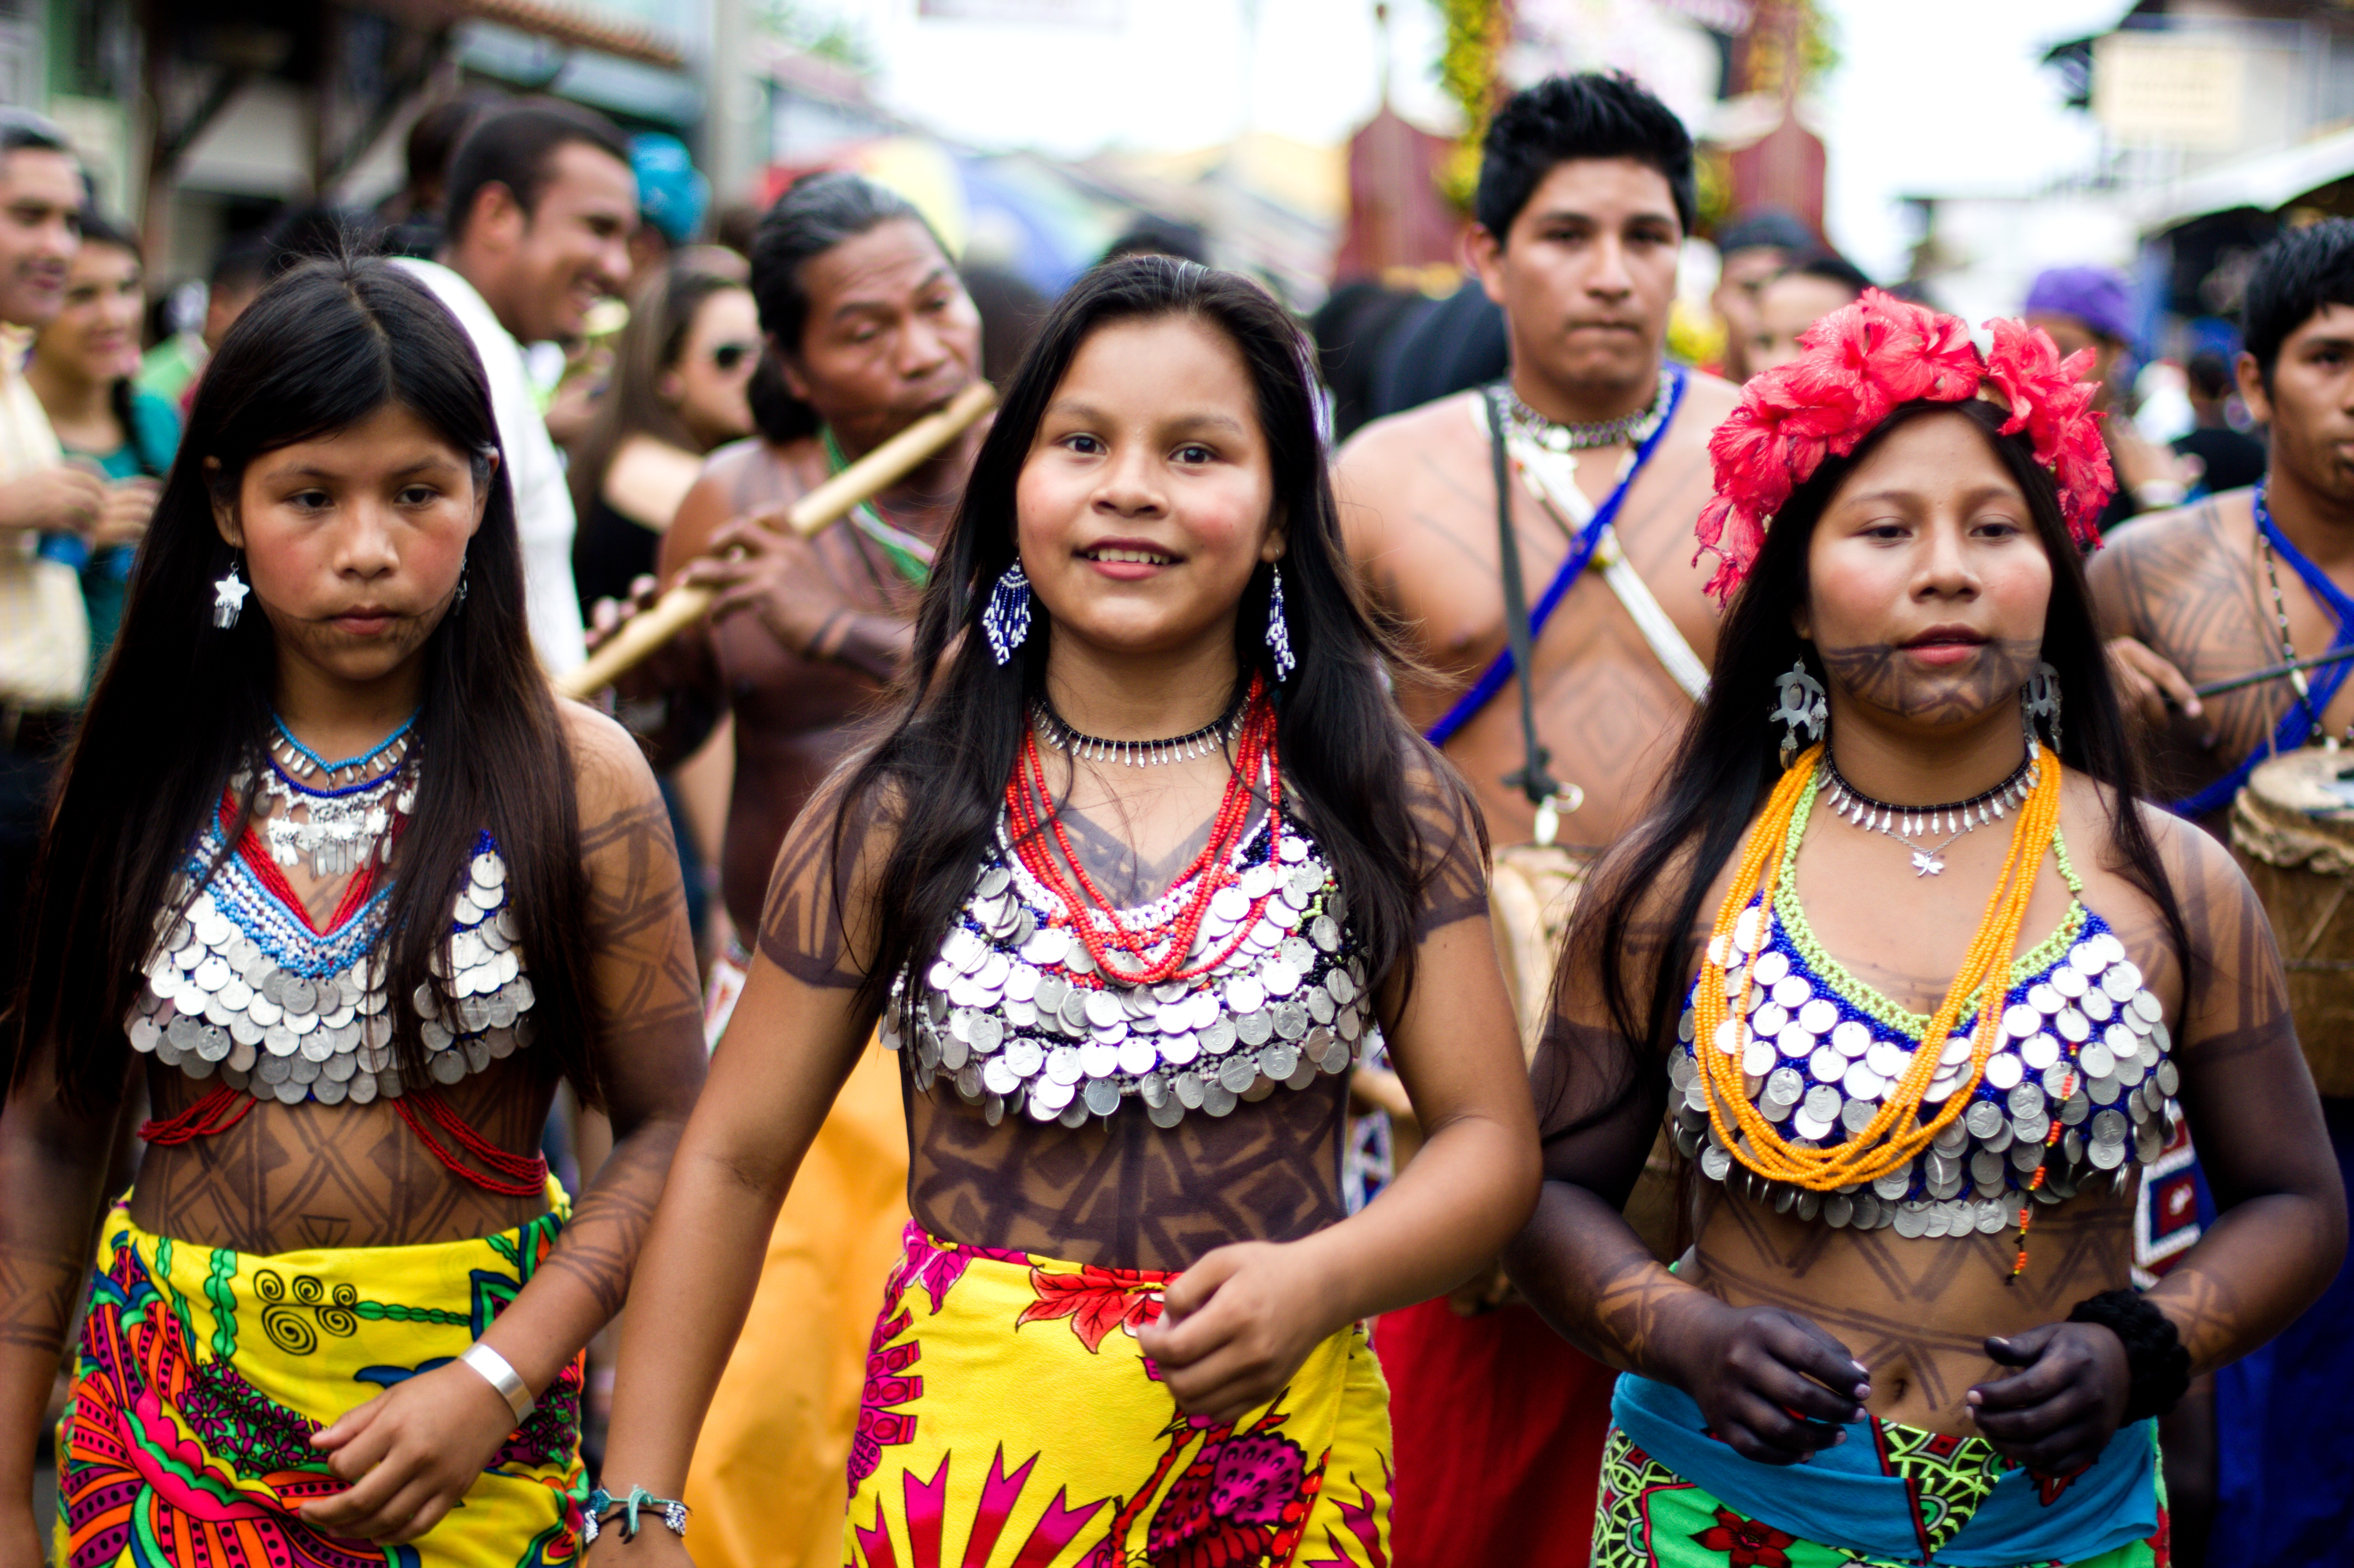 Jeunes femmes d'Embera